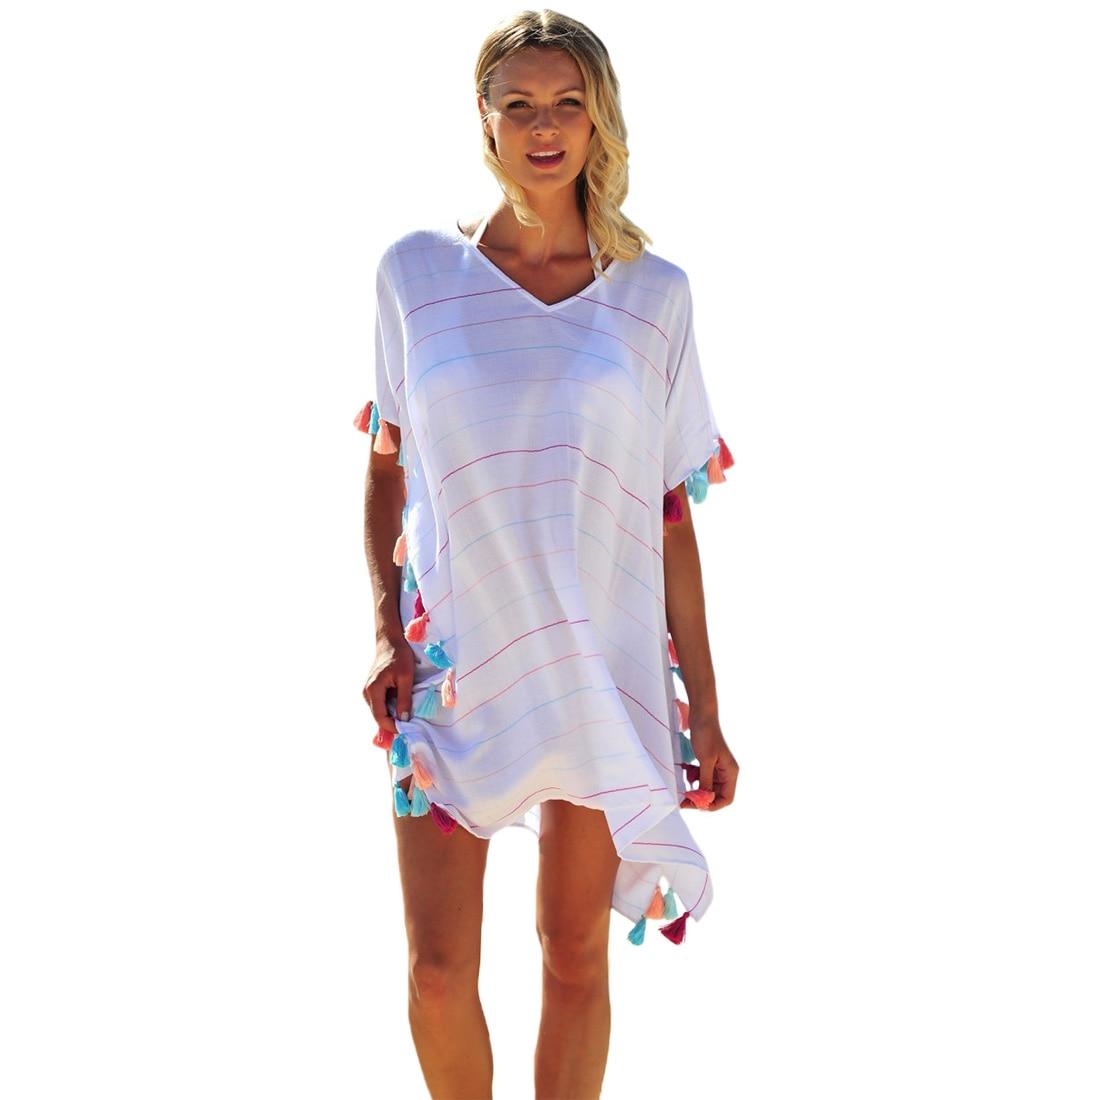 Women's Clothing Swimwear Holiday Women Blouse Printed Beach Casual Crew Neck Stylish Summer Chiffon Tassel Bikini Cover Up Batwing Sleeve Sexy Refreshment